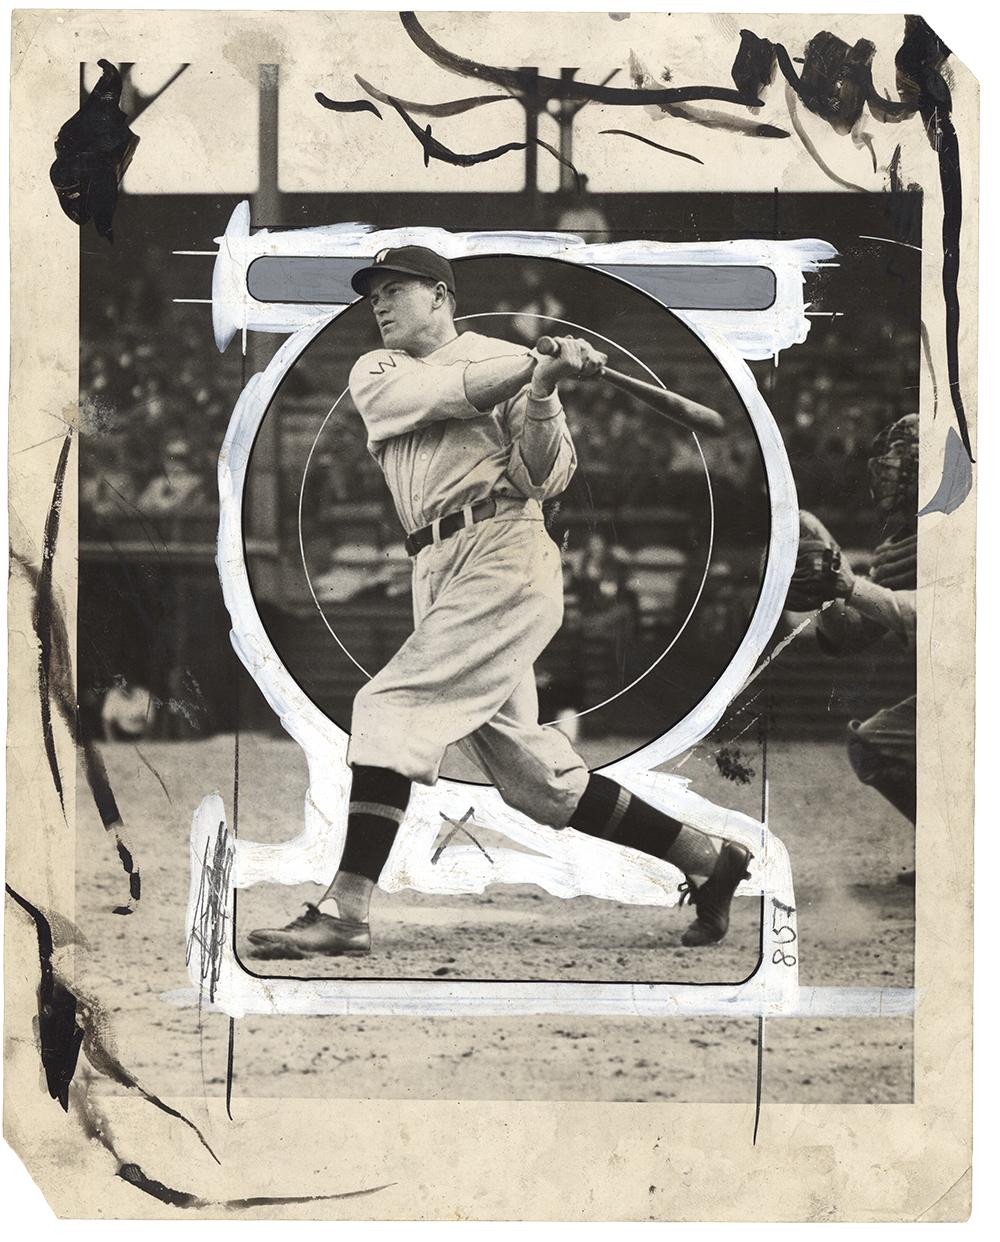 Photographer Unknown, Press photo: baseball, 1930s-1940s. Courtesy Pier 24 Photography, San Francisco.